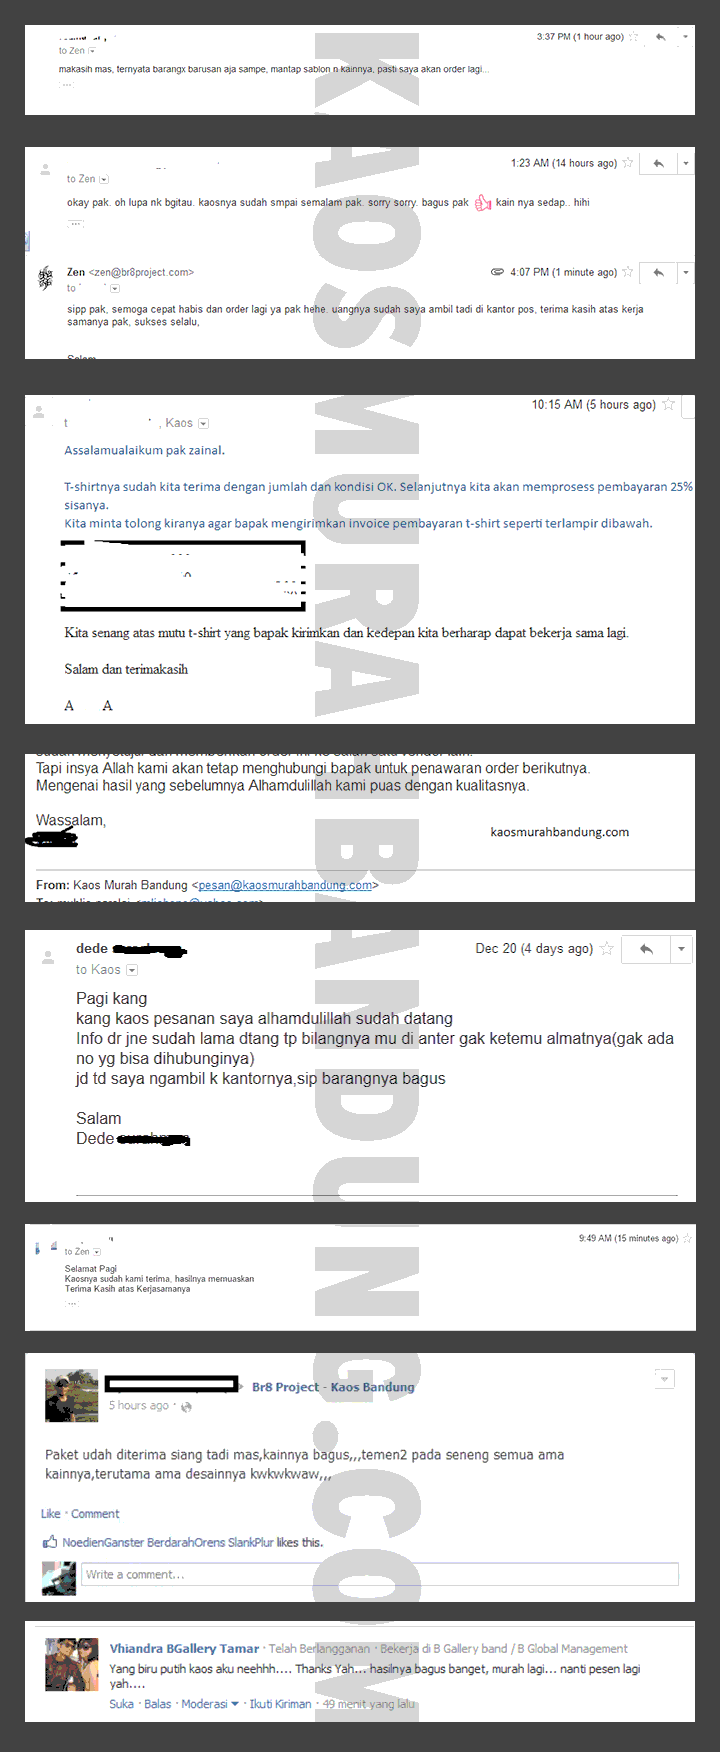 testimoni kaos murah bandung via email